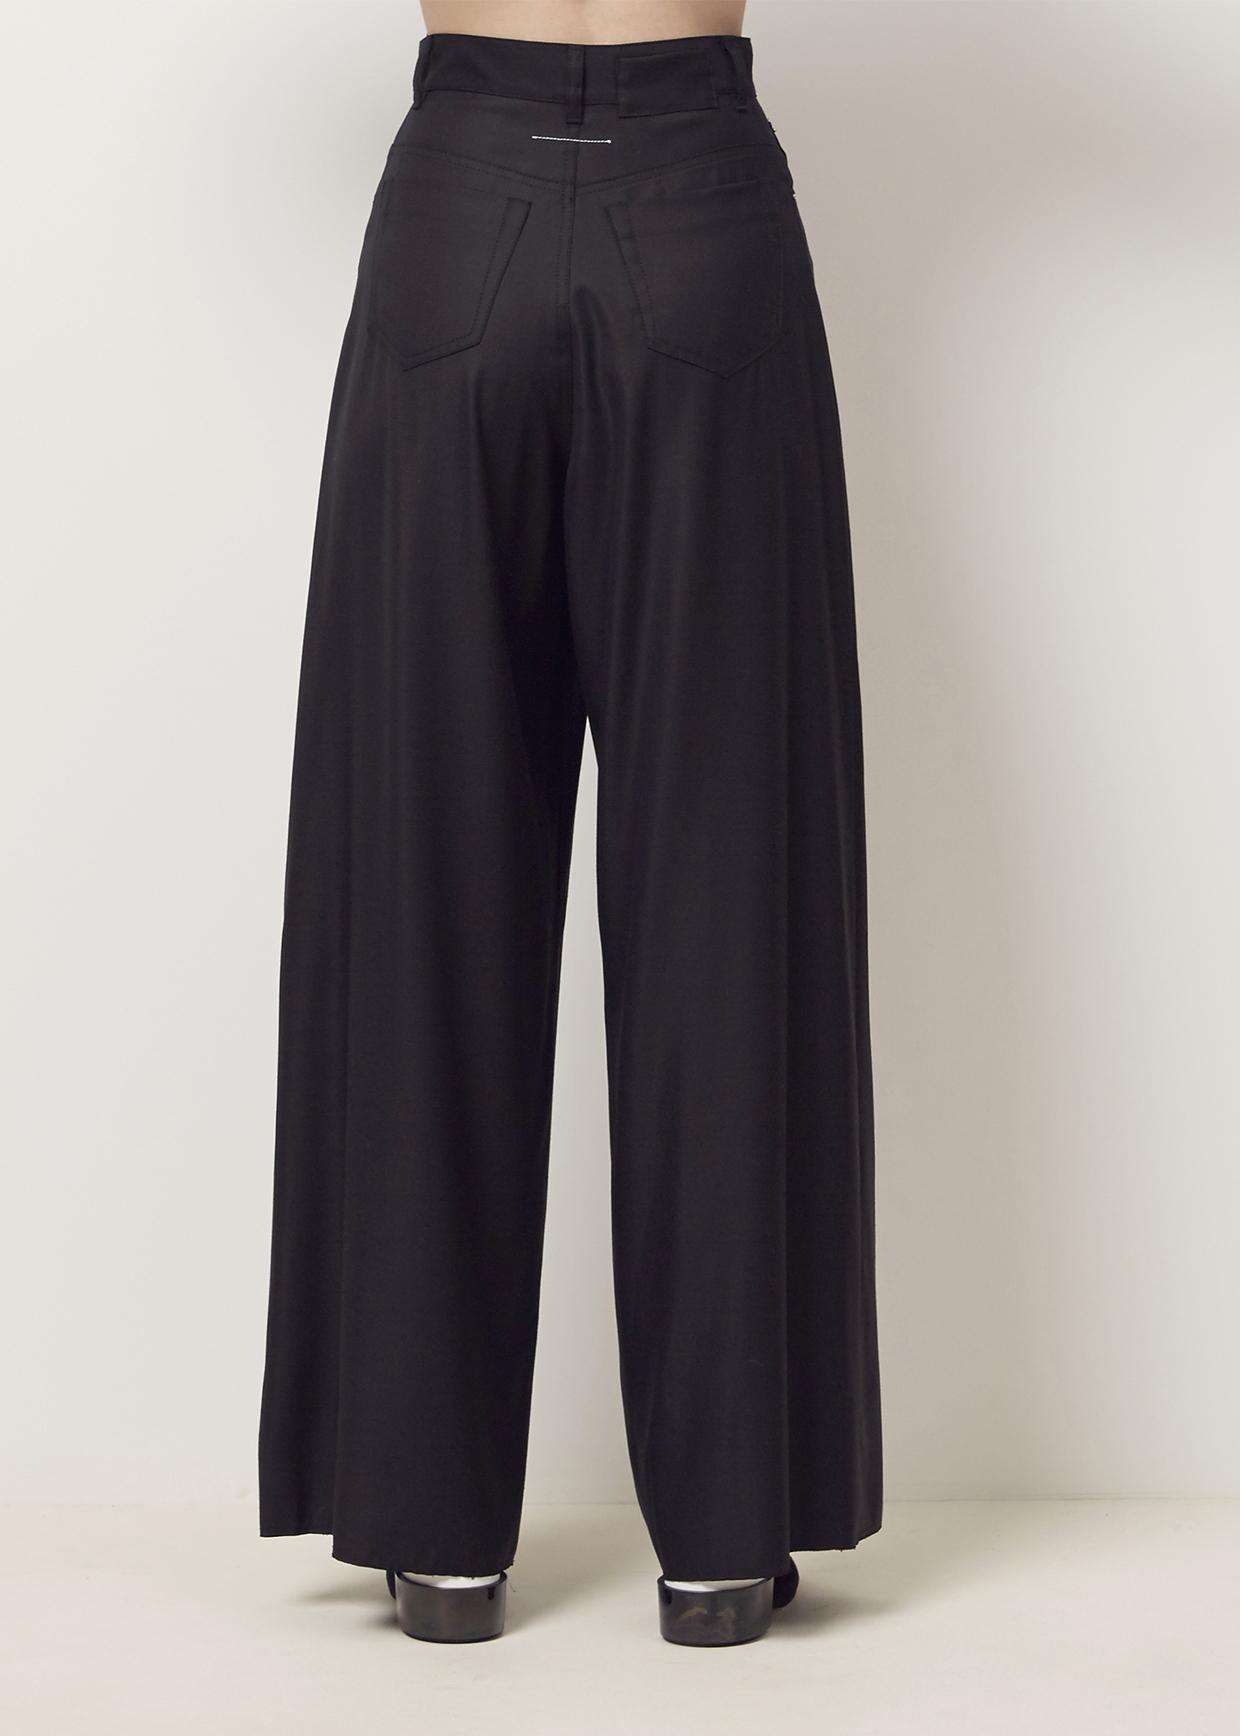 wide leg trousers - Black Maison Martin Margiela Ct5zLx35